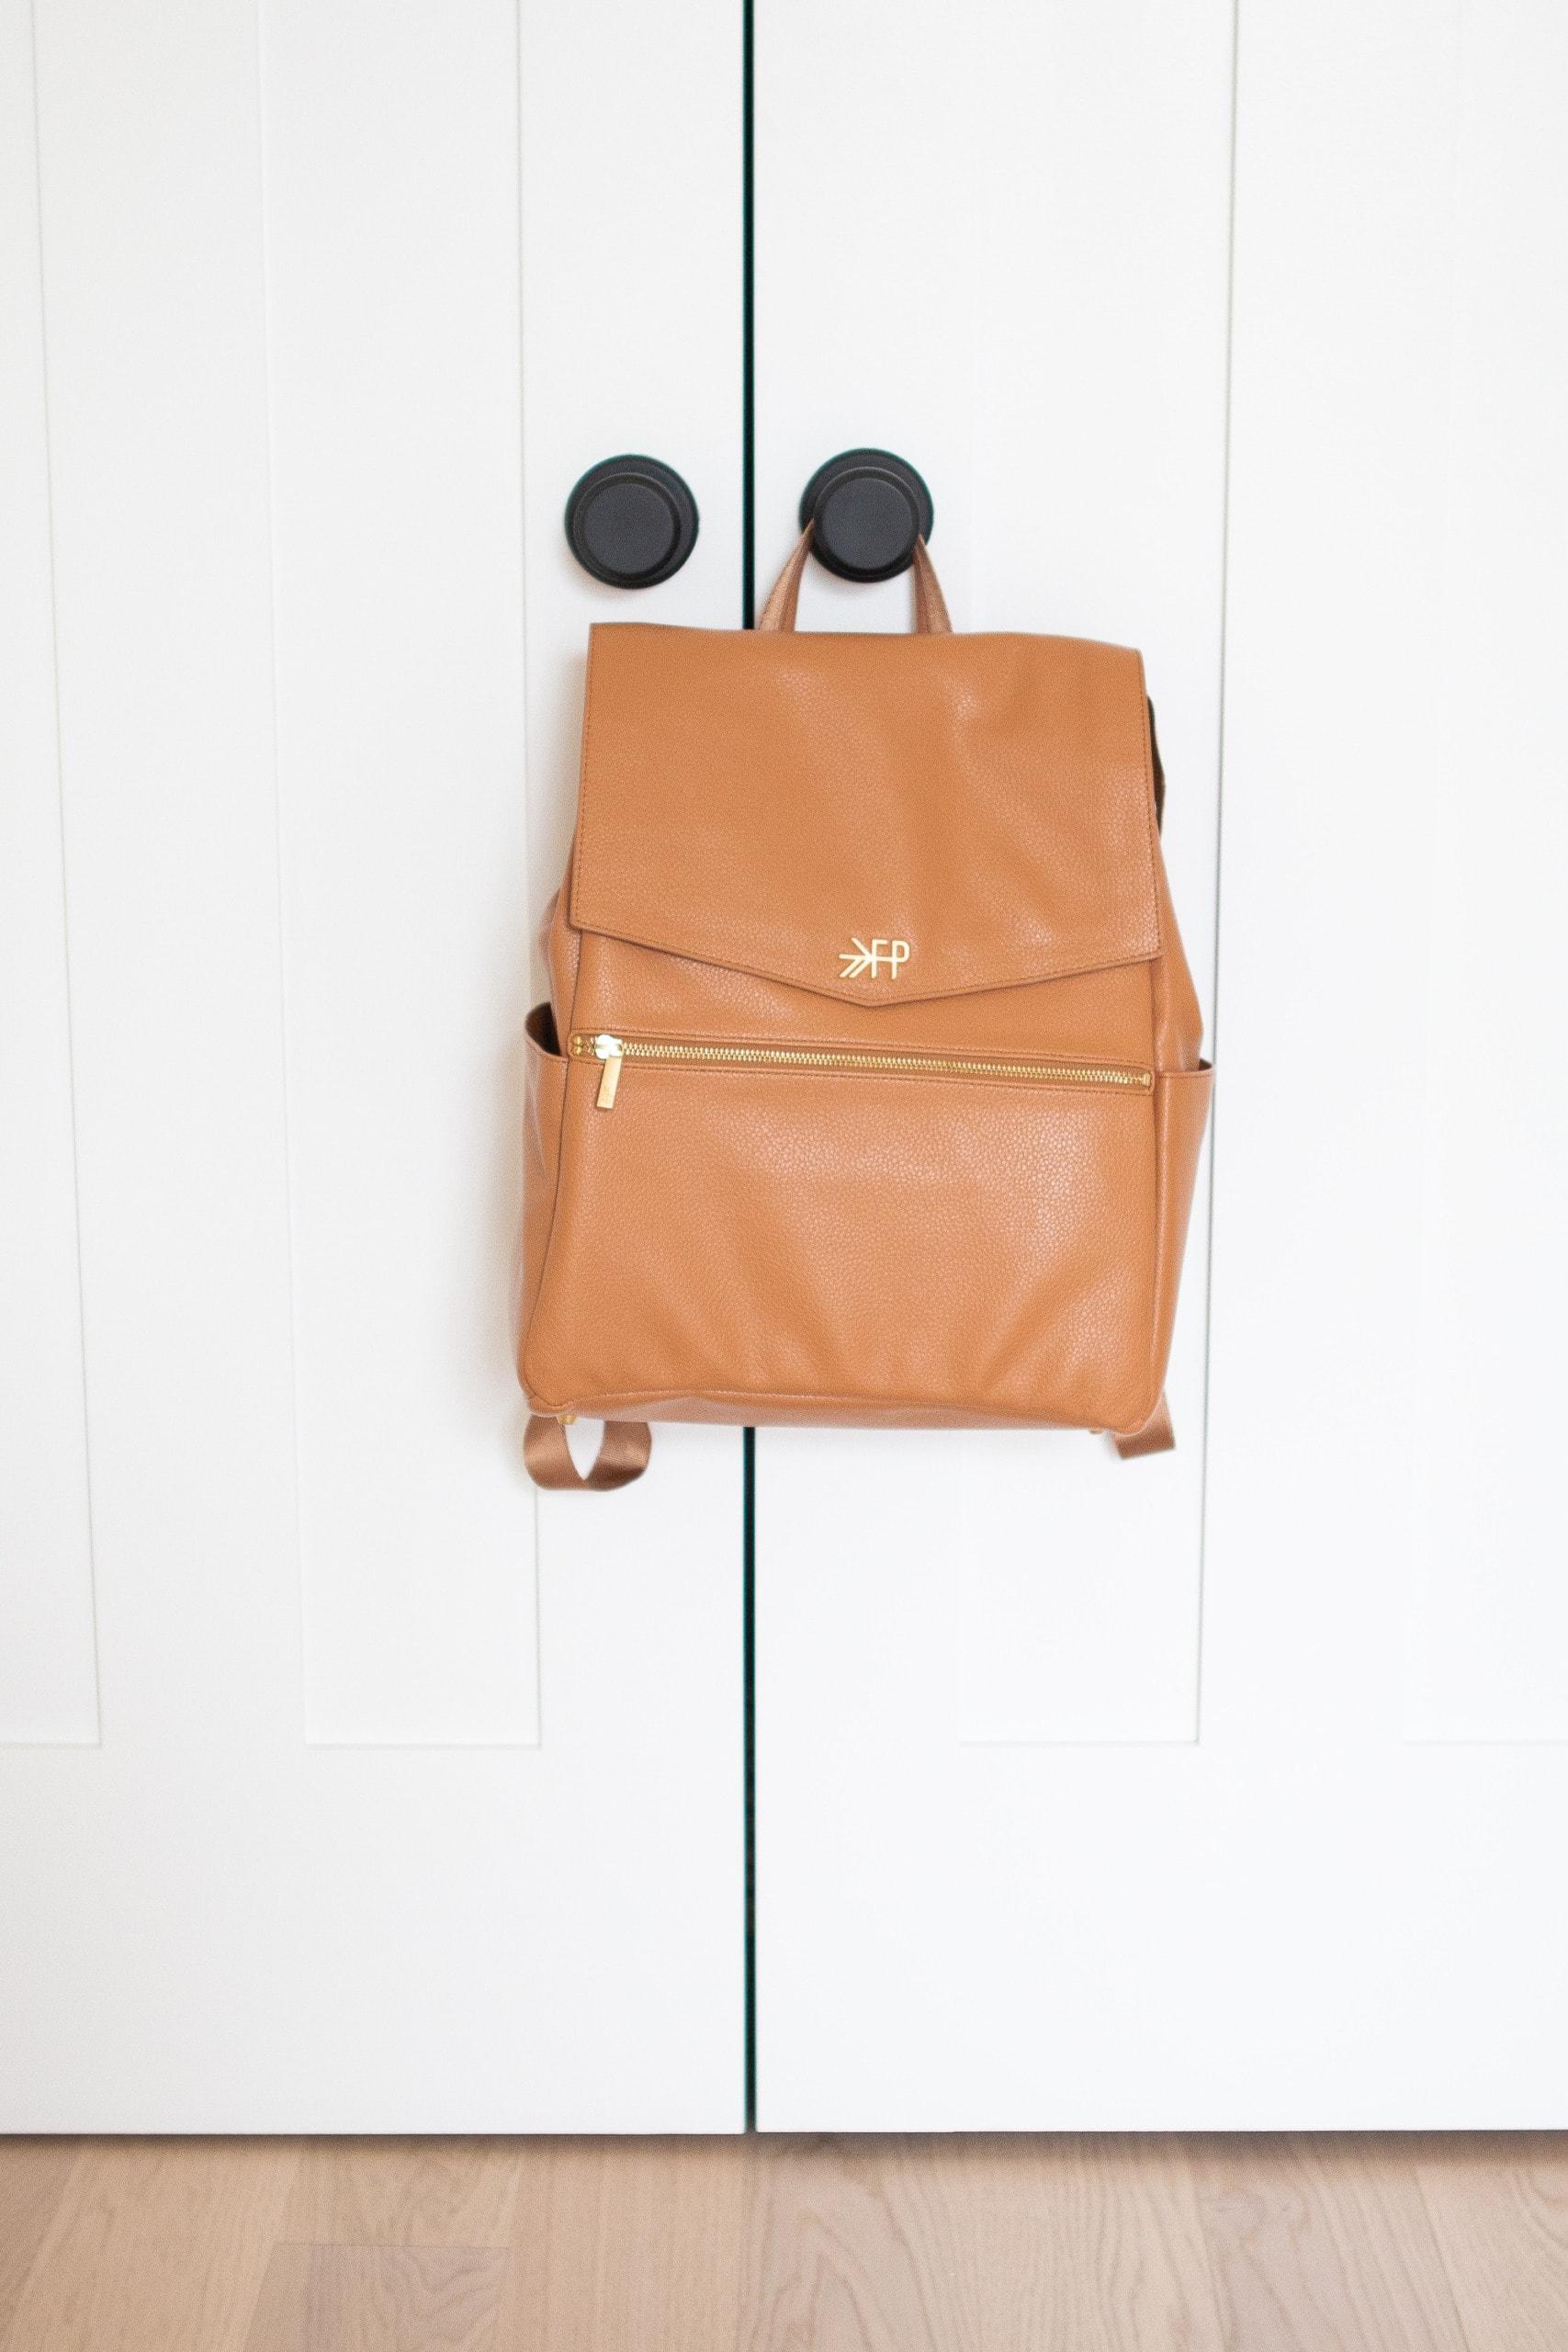 Brown leather diaper bag